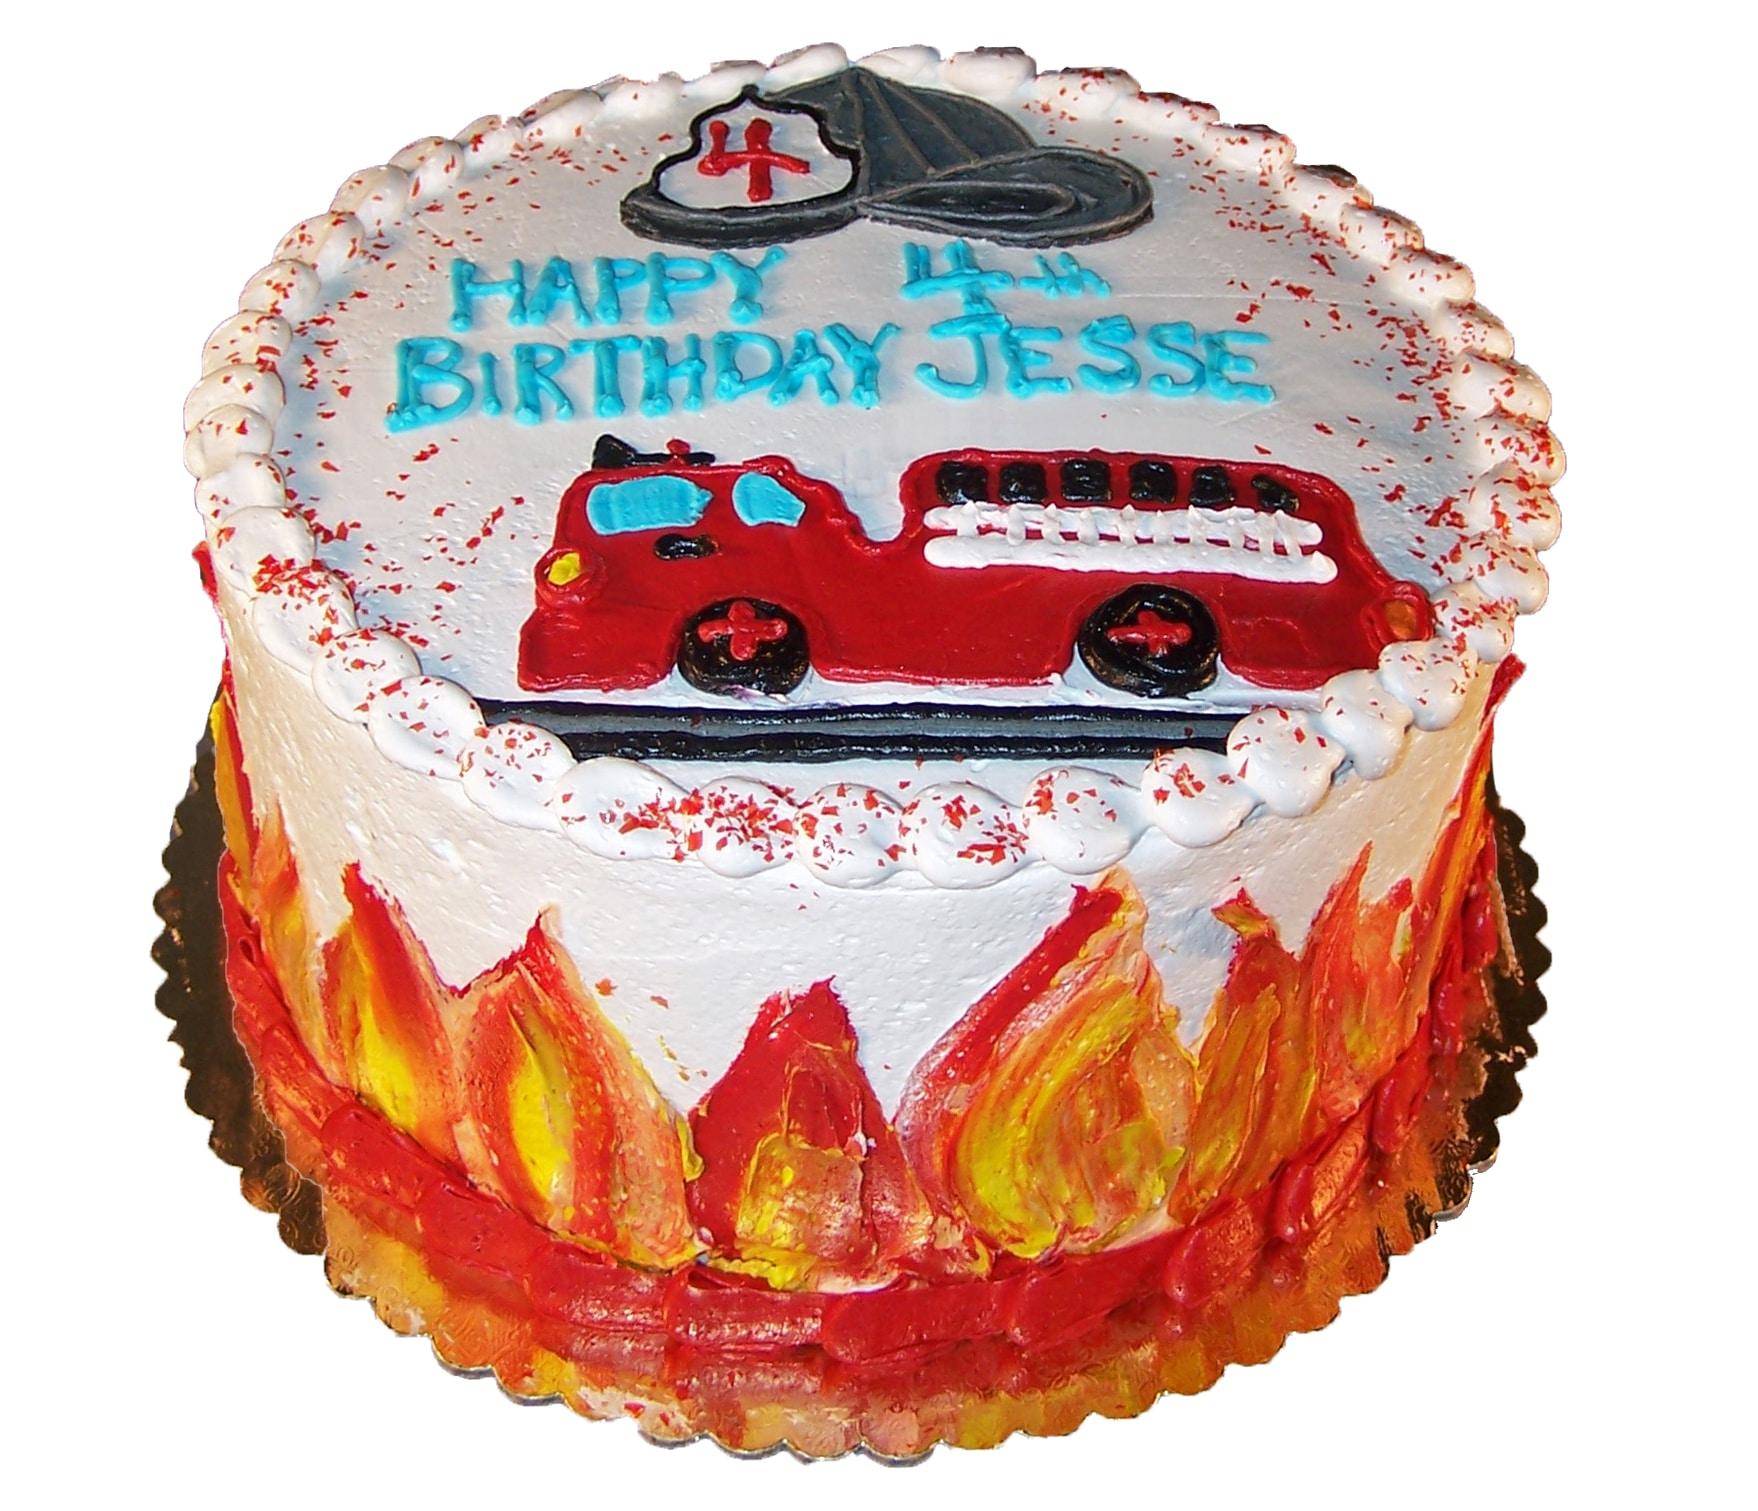 Admirable Birthday Cake 55 Aggies Bakery Cake Shop Personalised Birthday Cards Paralily Jamesorg